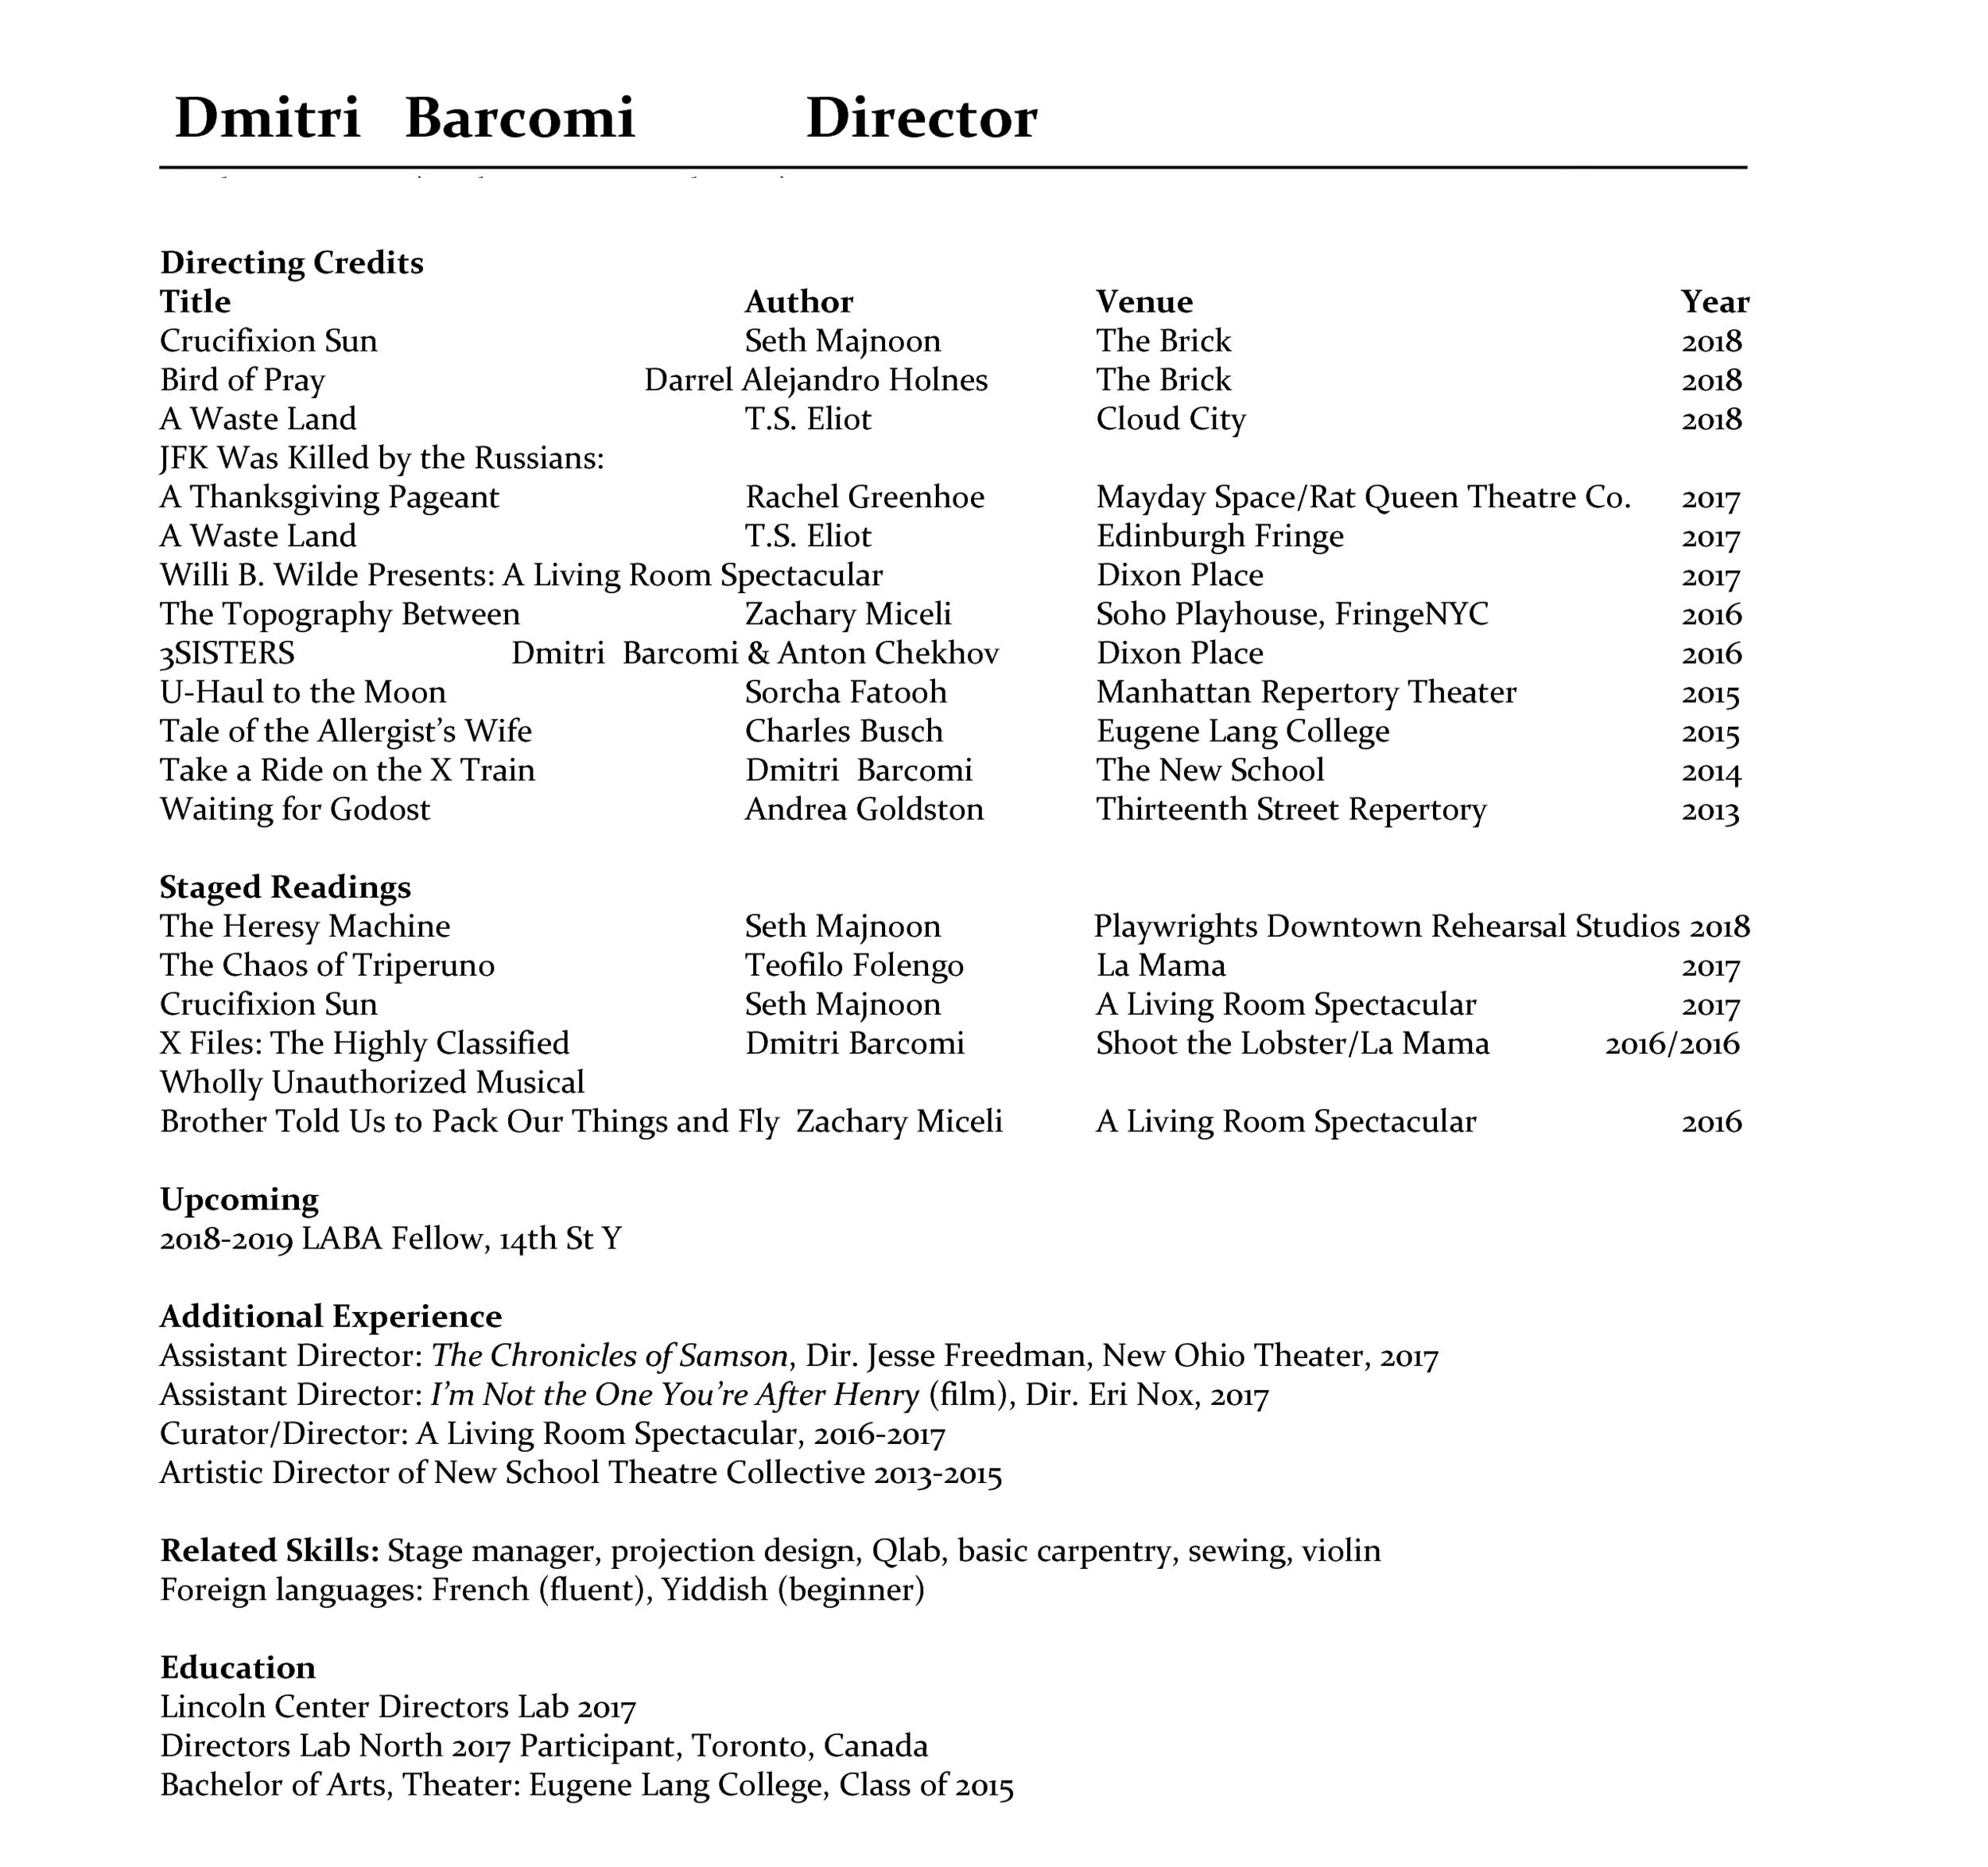 Dmitri Barcomi Resume.png